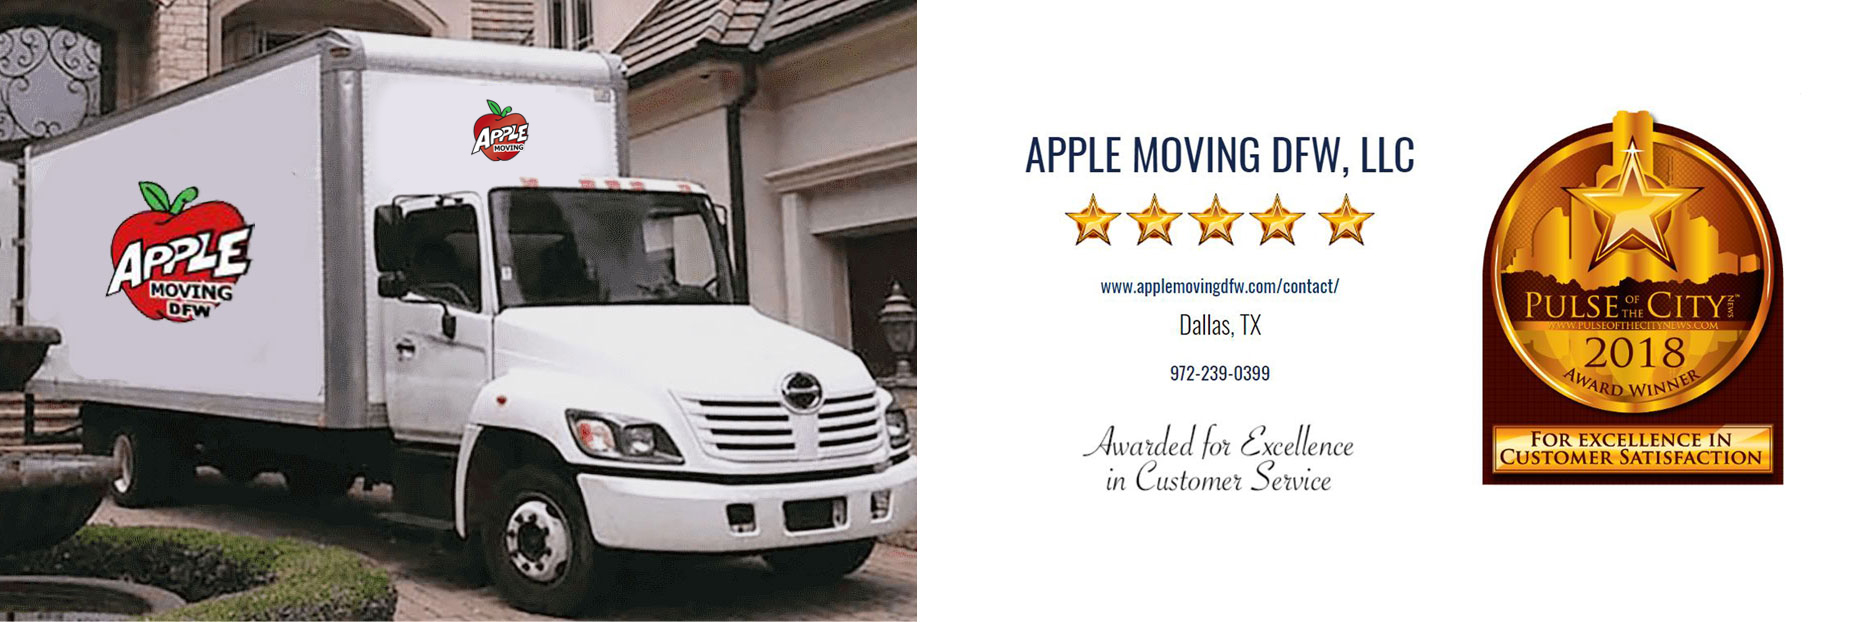 apple moving award dfw